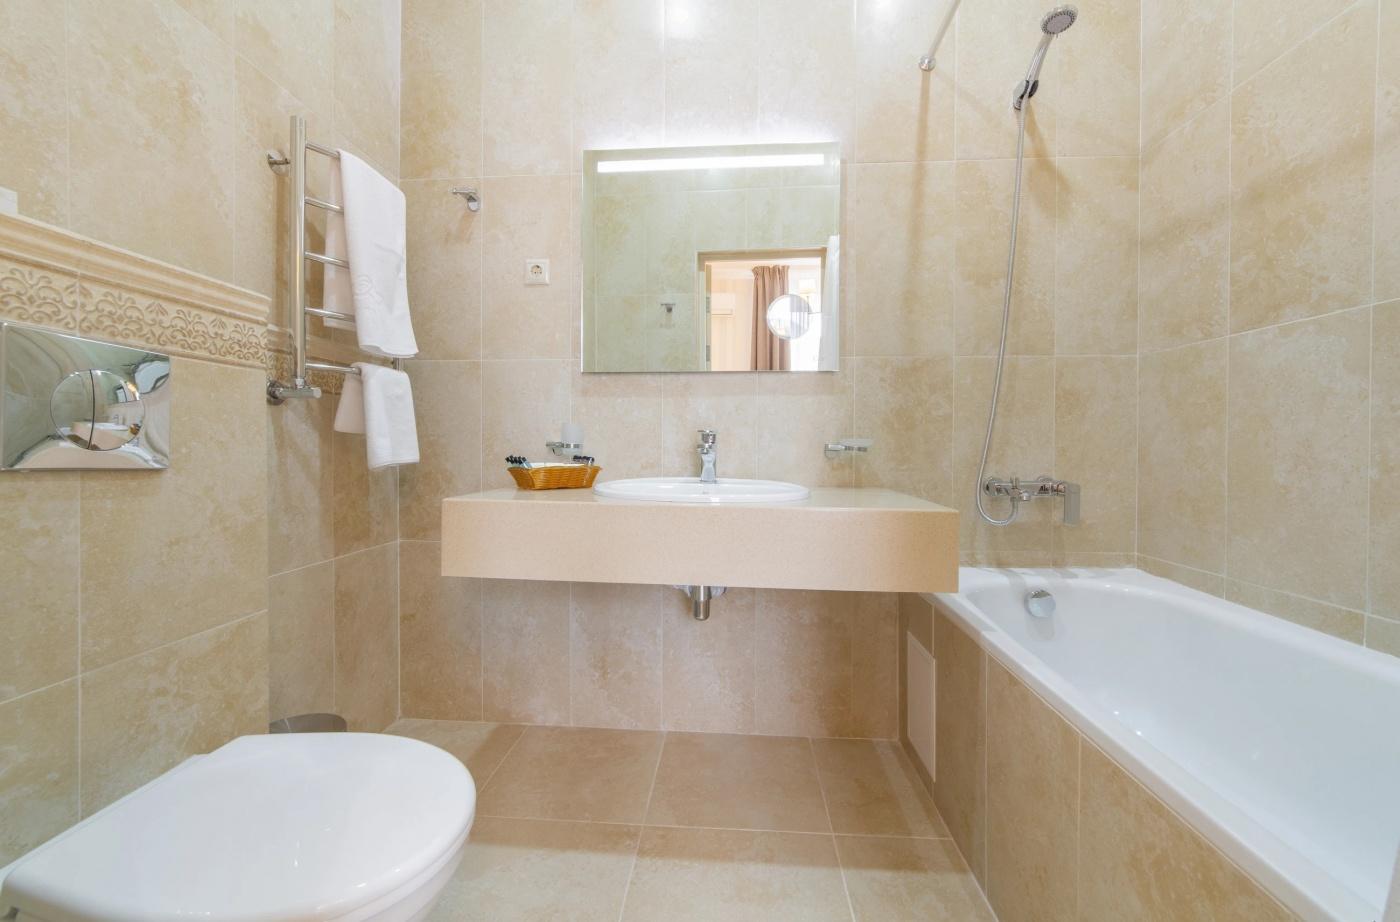 Отель «Alean Family Hotel Usadba 4*» Краснодарский край Стандарт 1-местный, фото 3